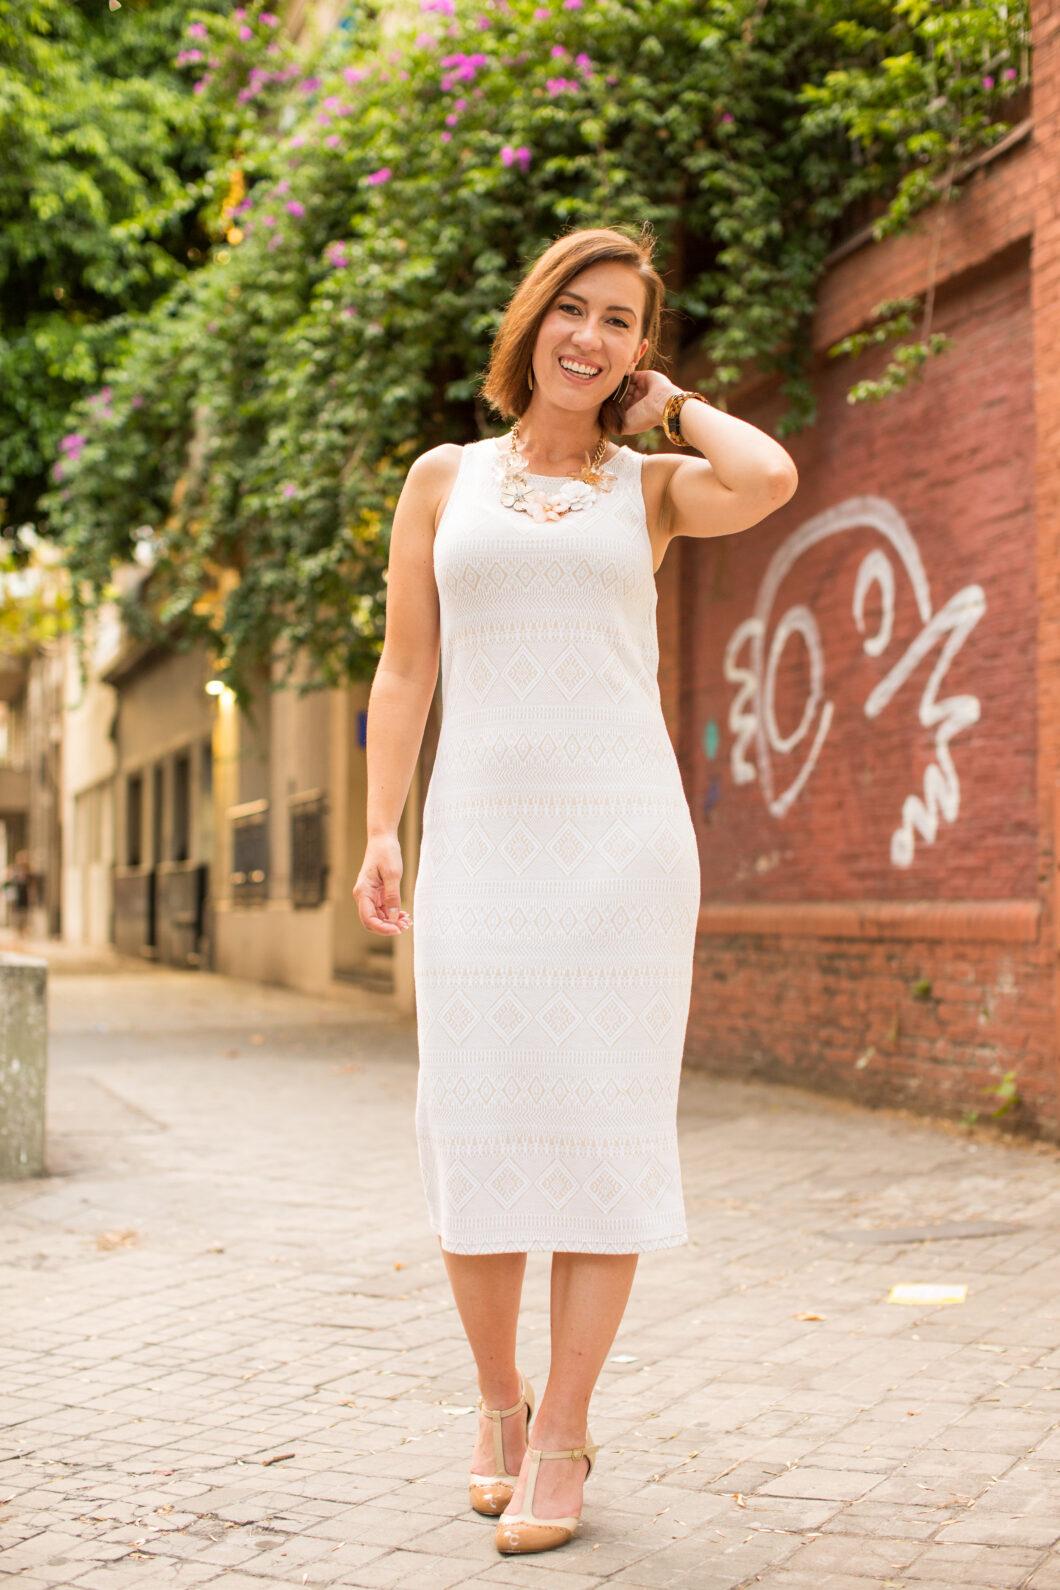 Summer Ready With a Sheath Dress